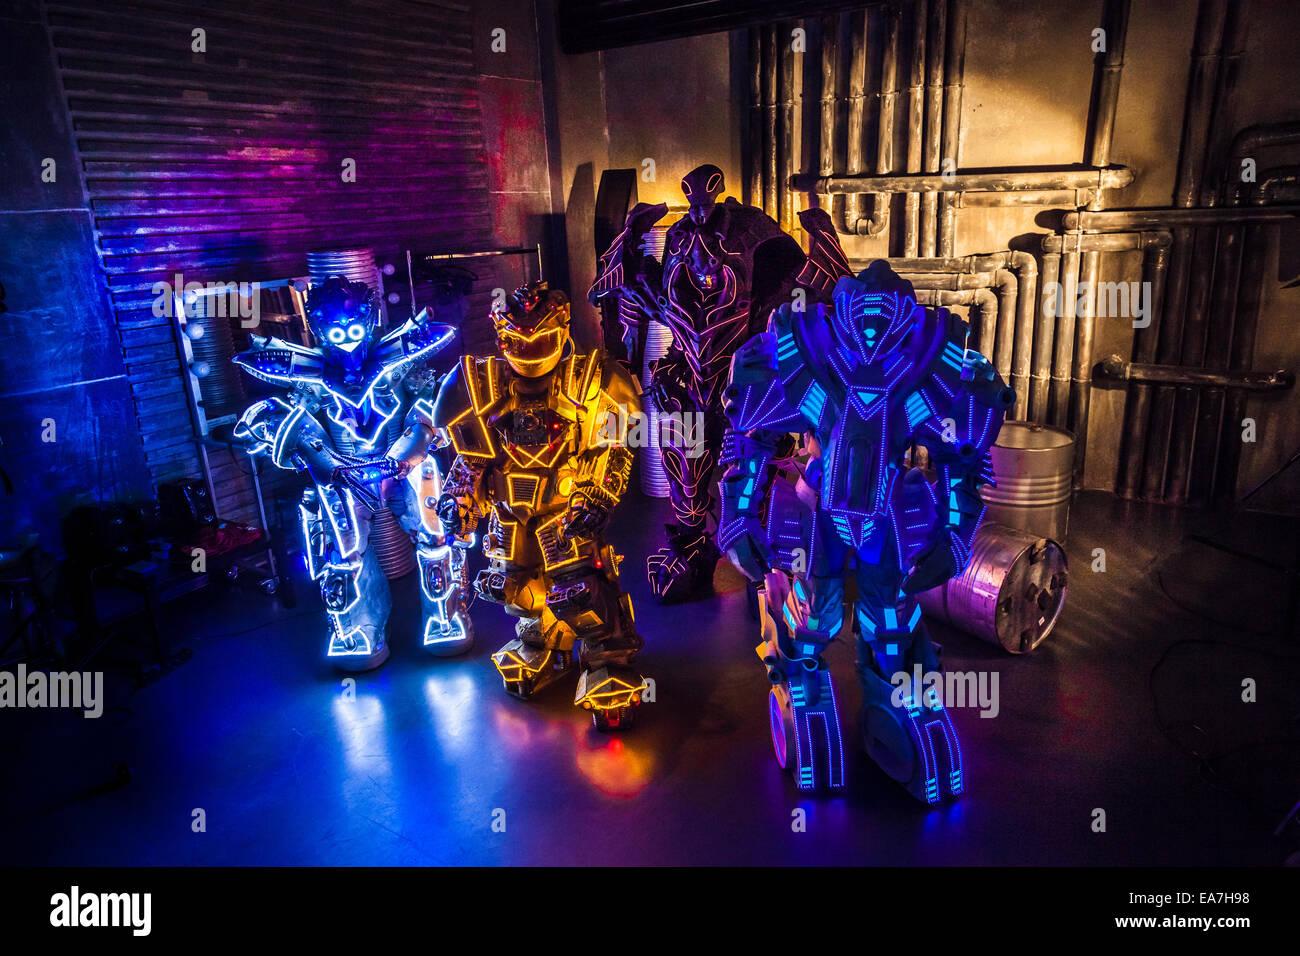 Futuristic robots - Stock Image